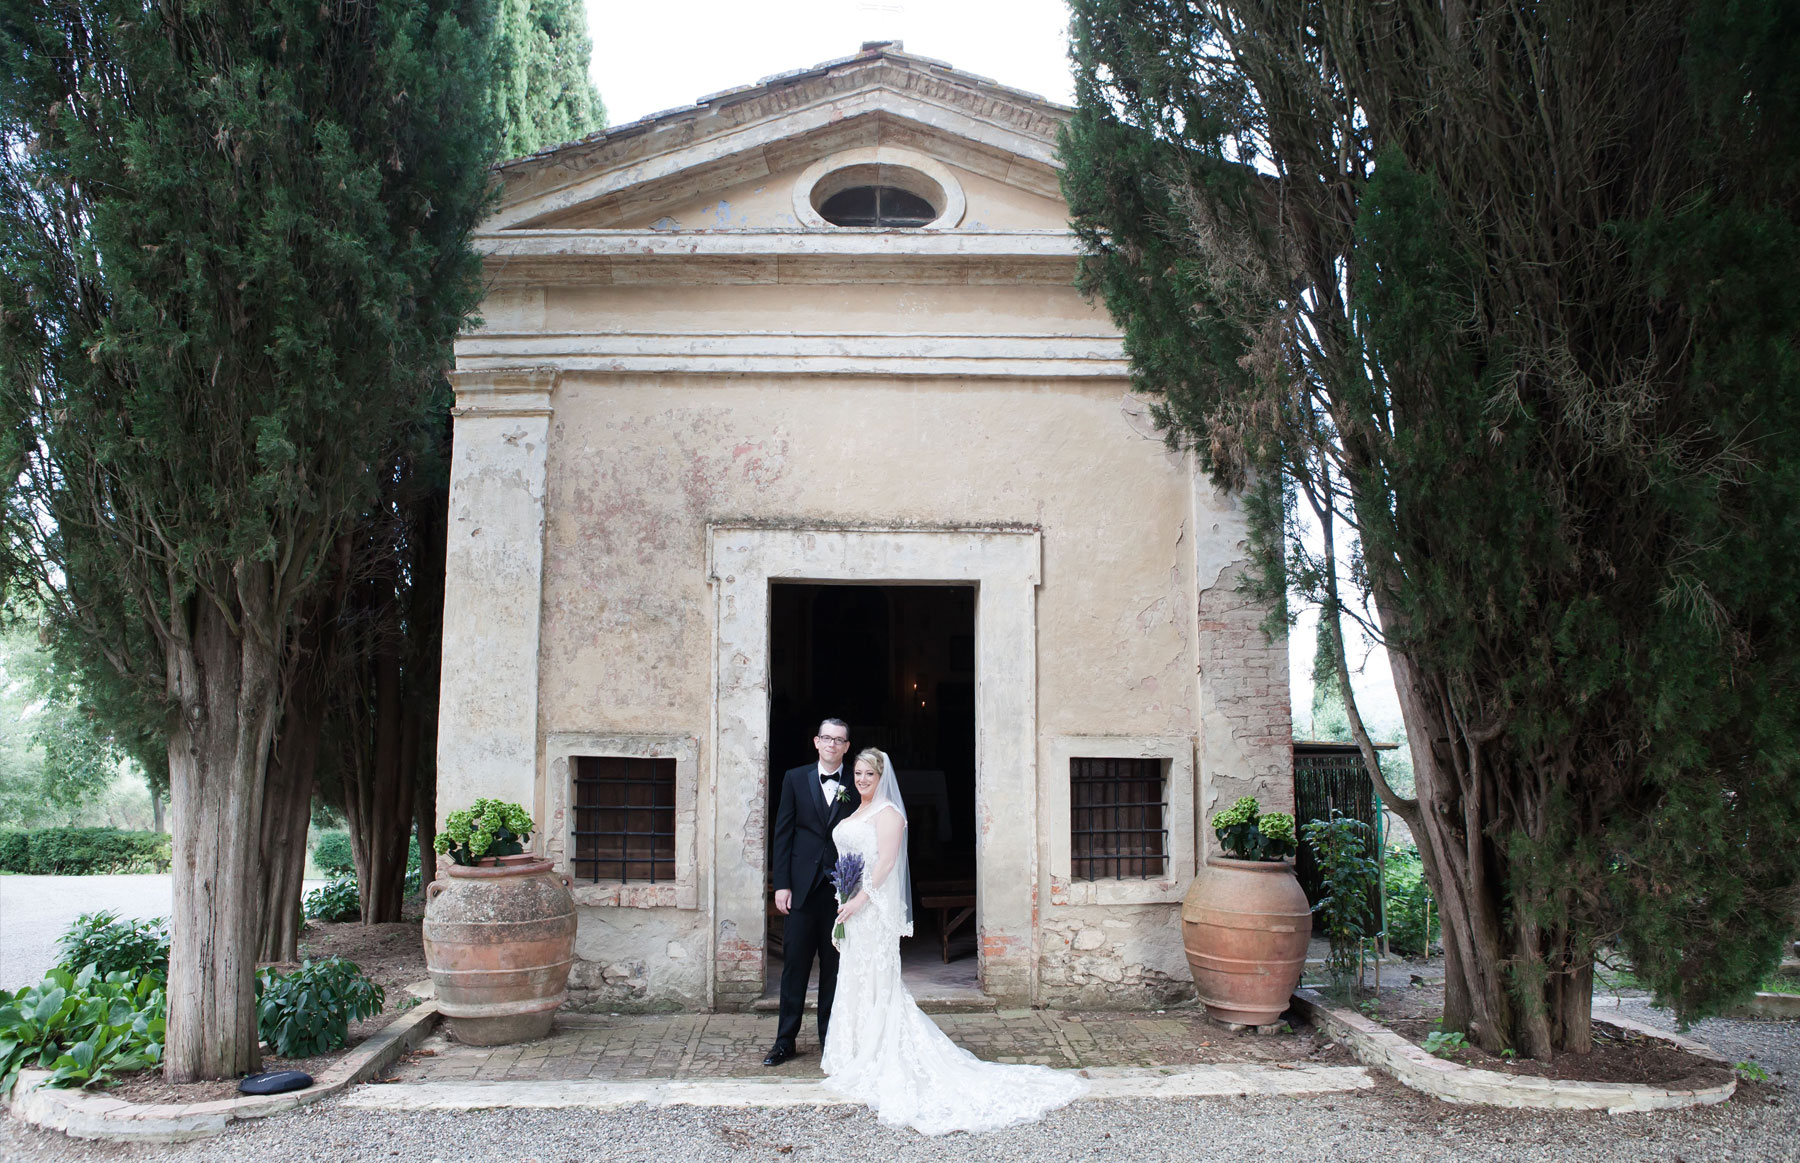 Bride and groom outside wedding chapel